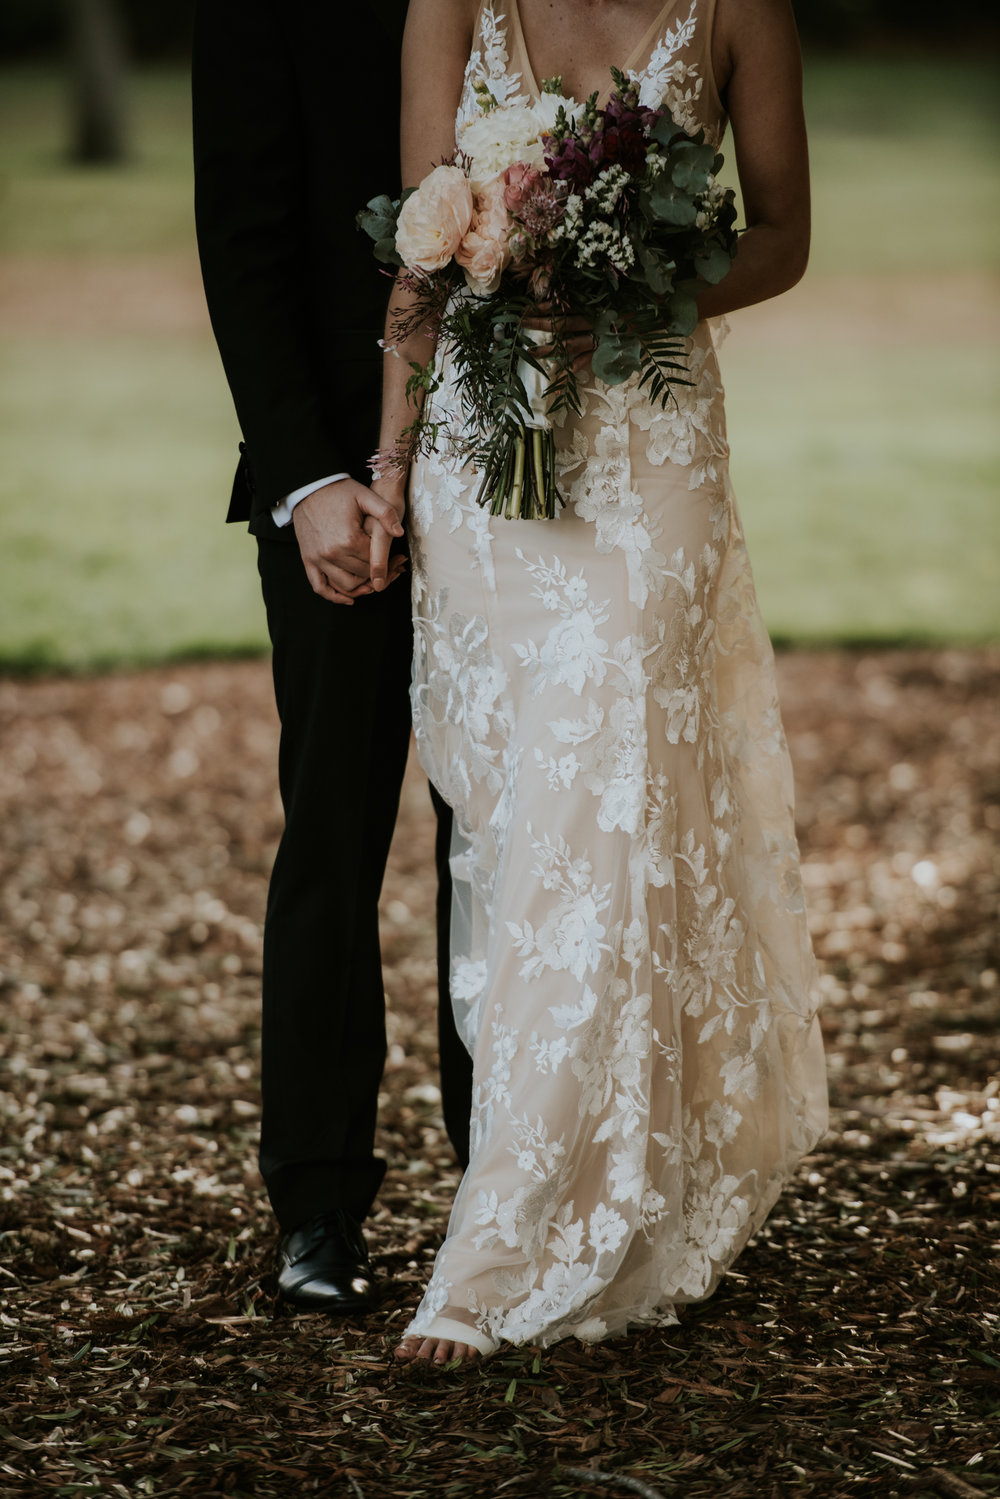 Brisbane Wedding Photographer | Engagement-Elopement Photography | Factory51-City Botantic Gardens Wedding-48.jpg